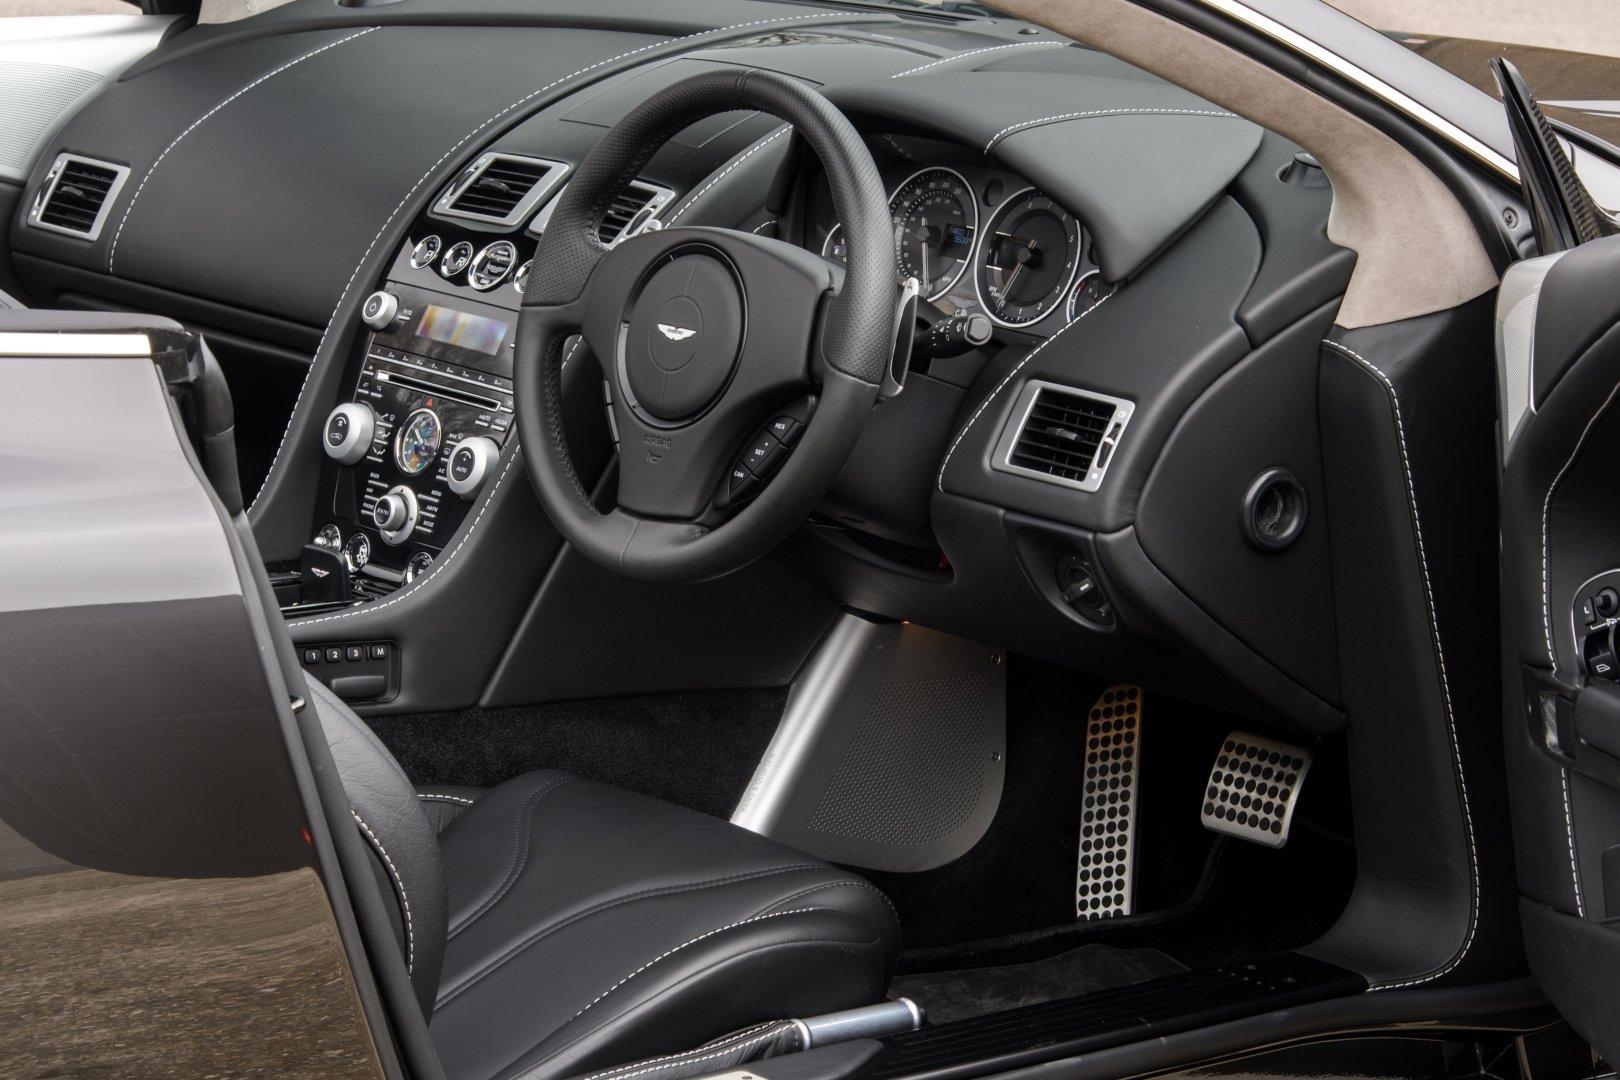 2011 Aston Martin DBS Volante  For Sale (picture 3 of 6)